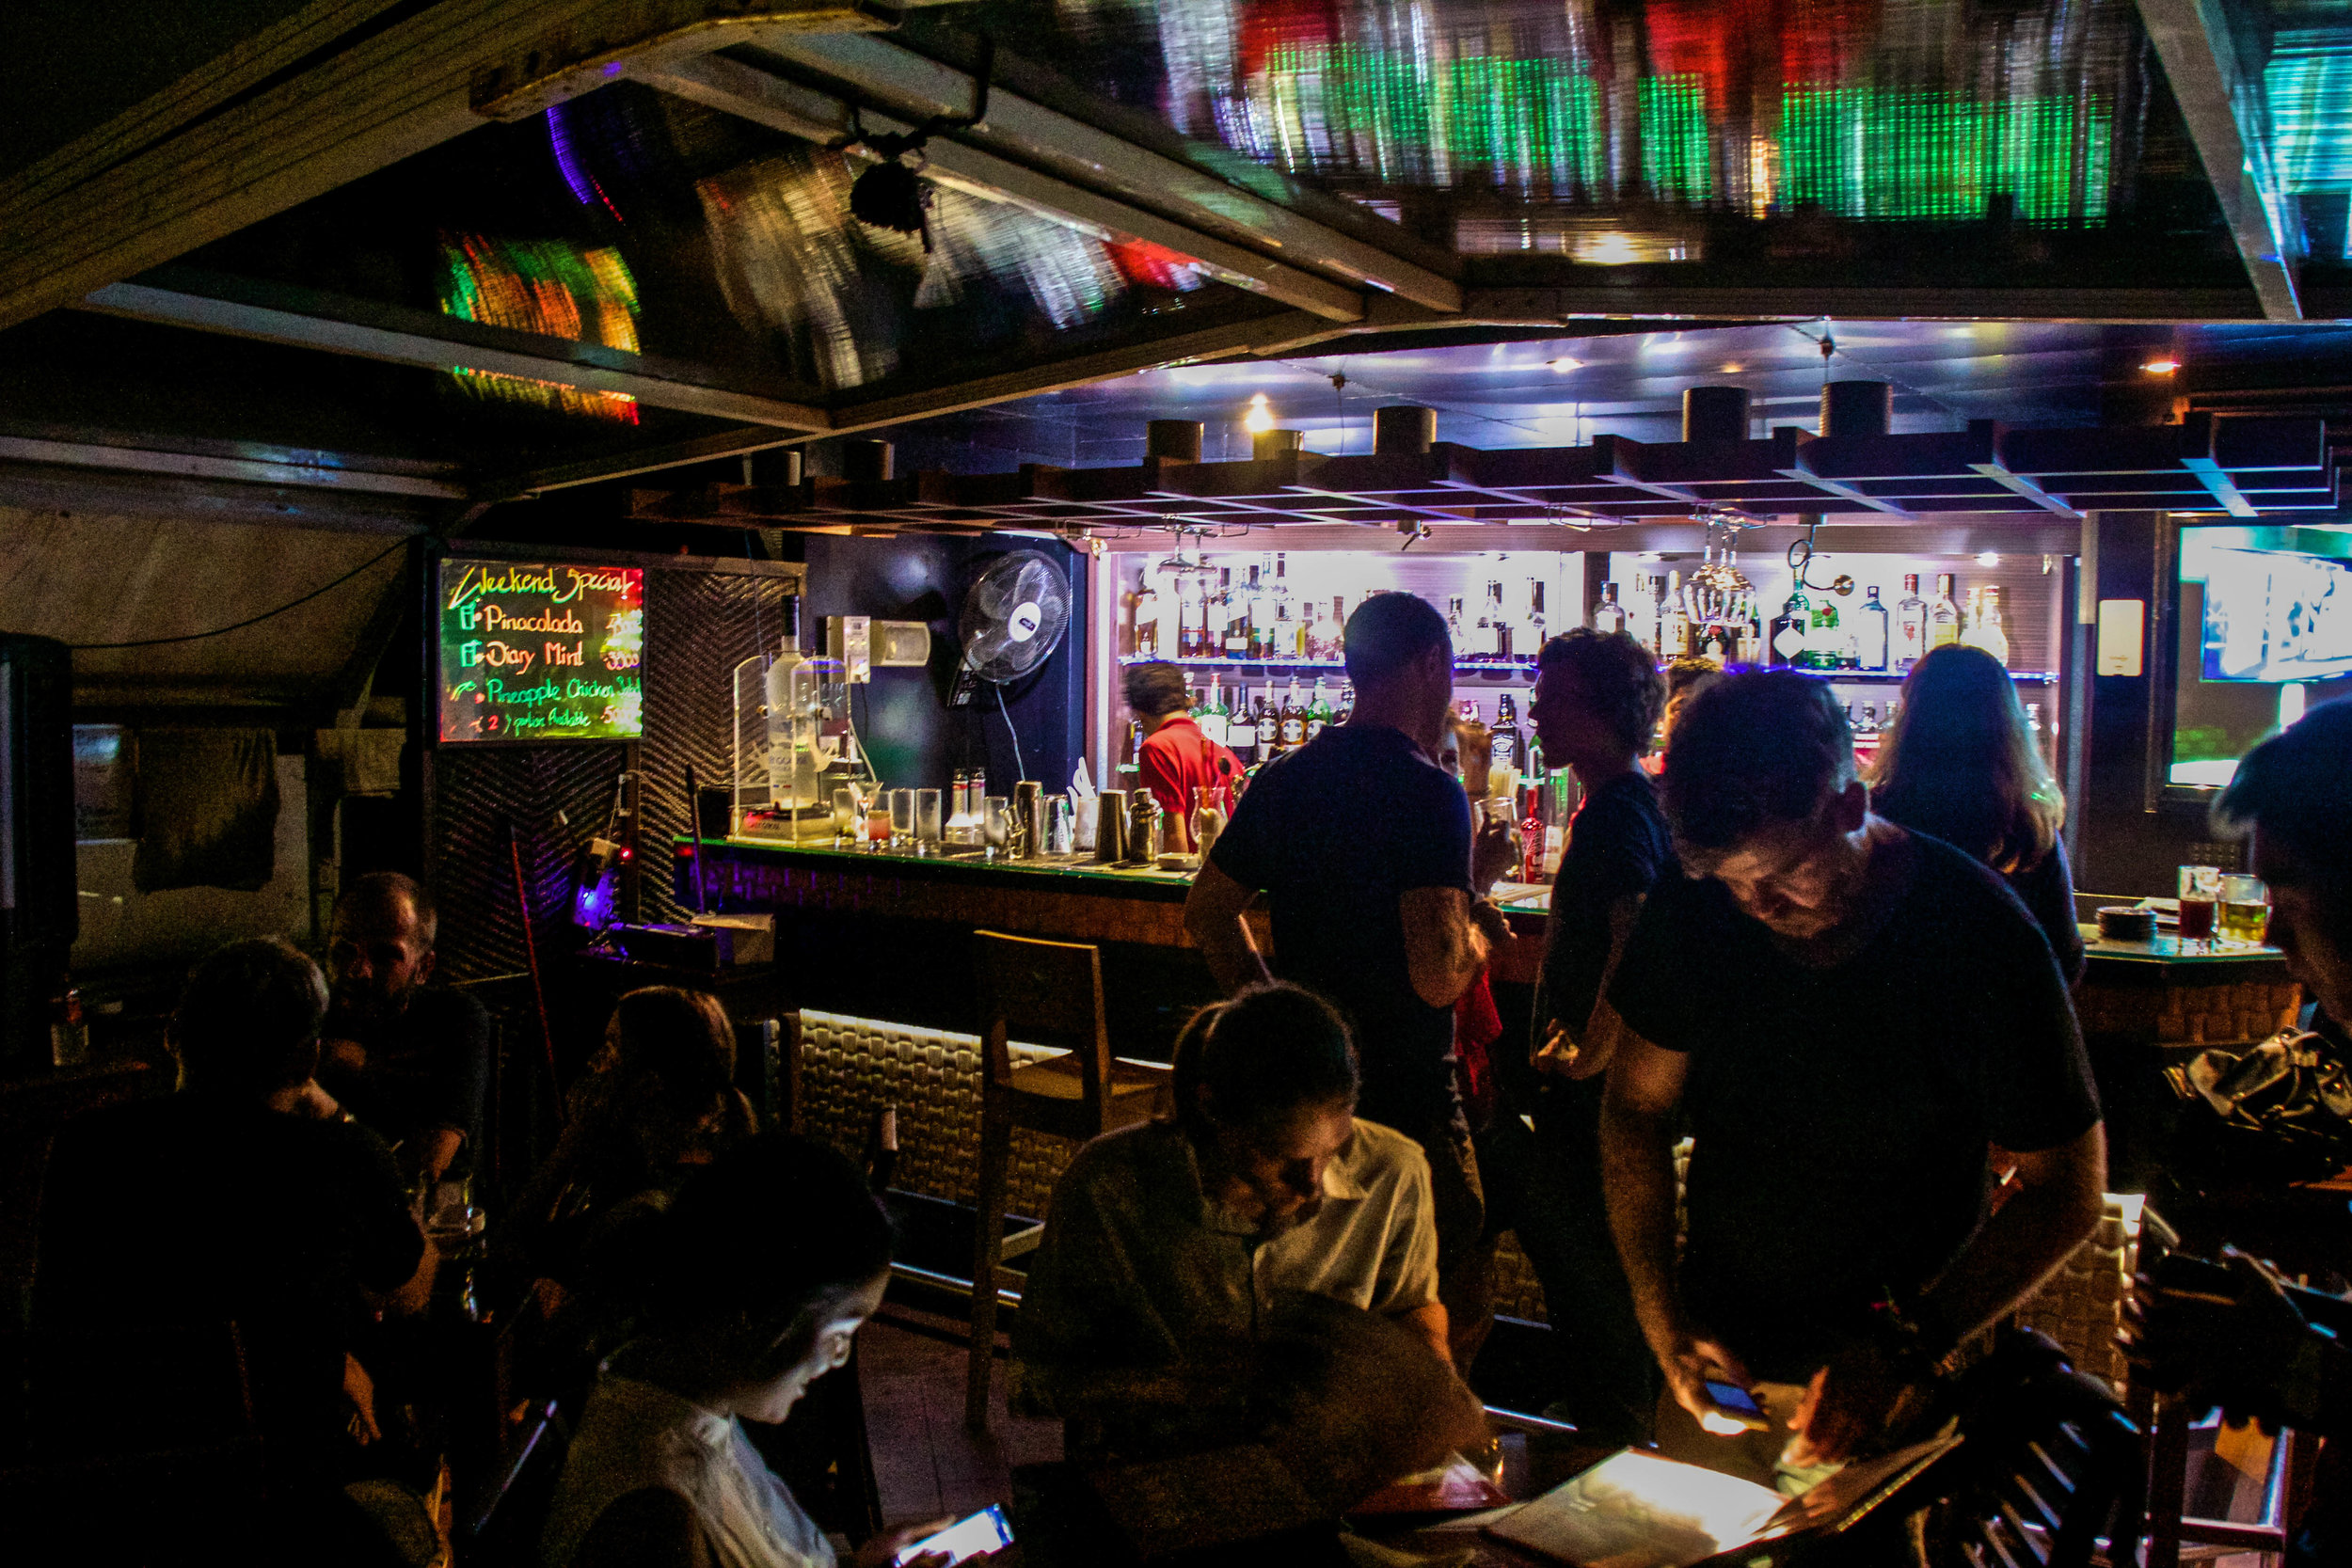 vista bar nightlife rangoon yangon burma myanmar 2-2.jpg